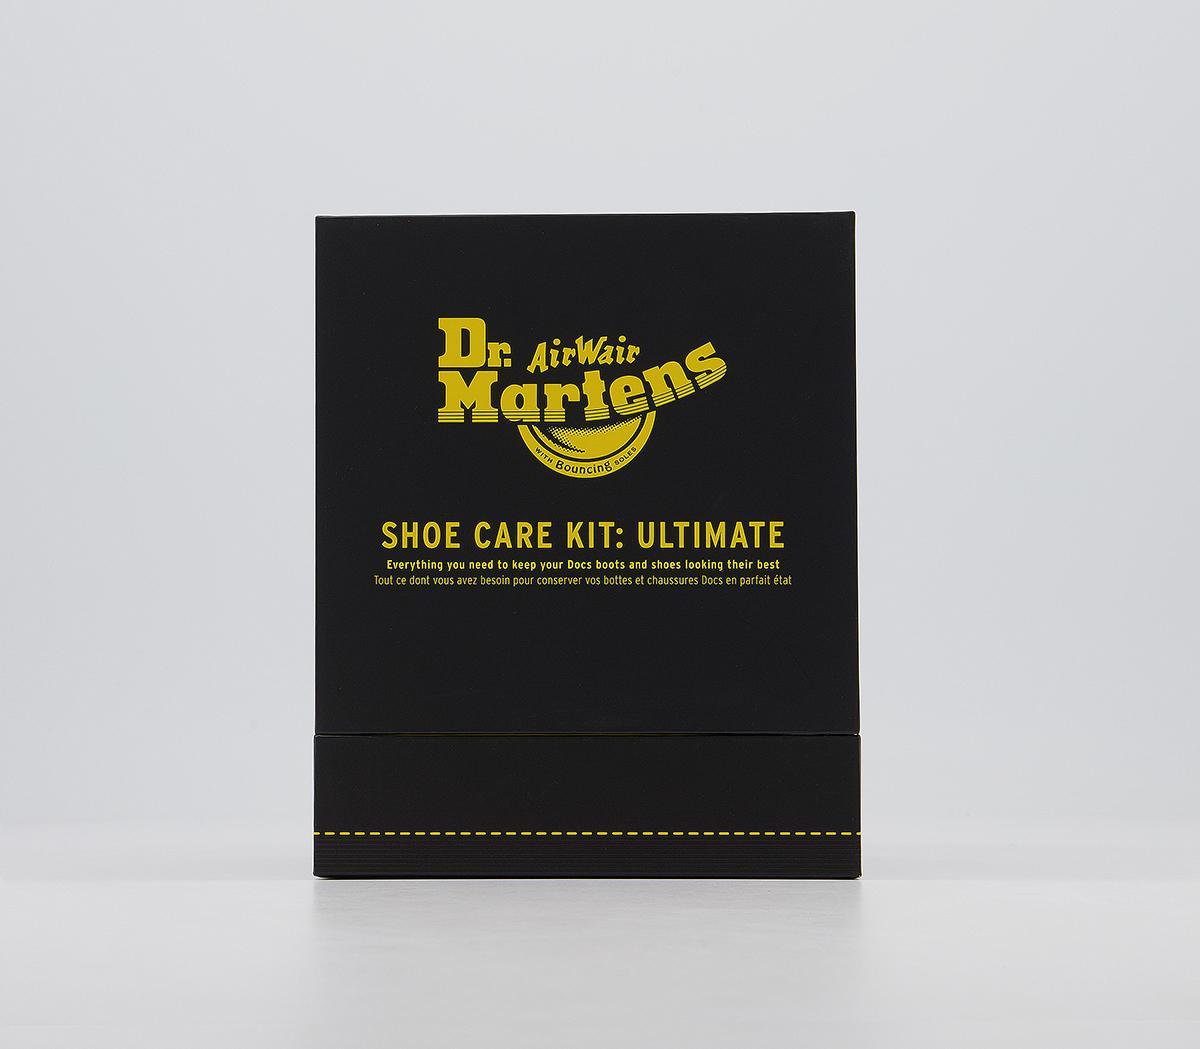 Dr Martens Premium Shoecare Kit